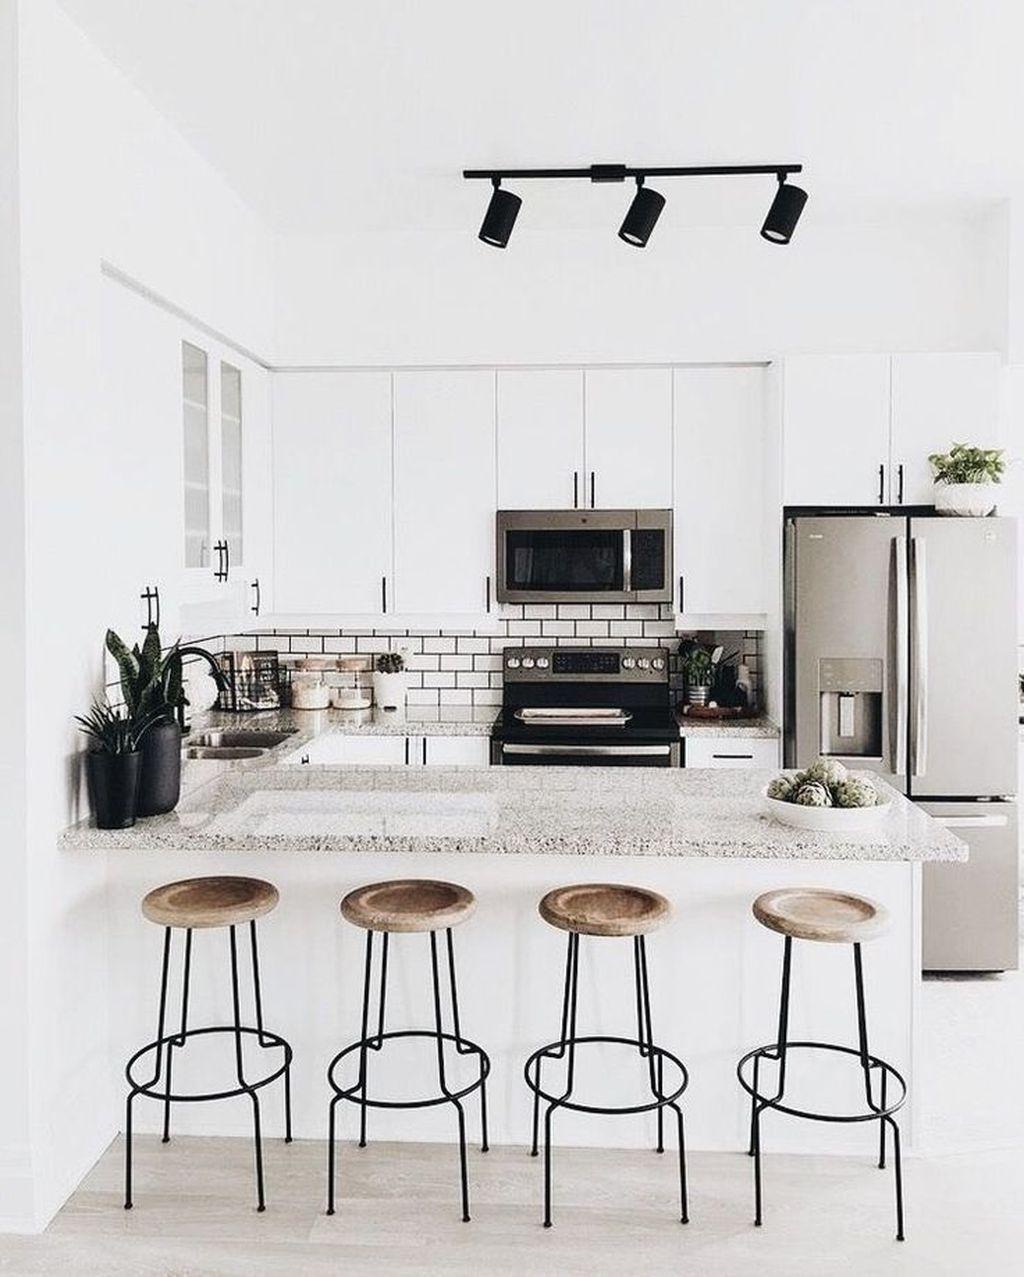 Popular Minimalist Kitchen Design Ideas You Never Seen Before 24